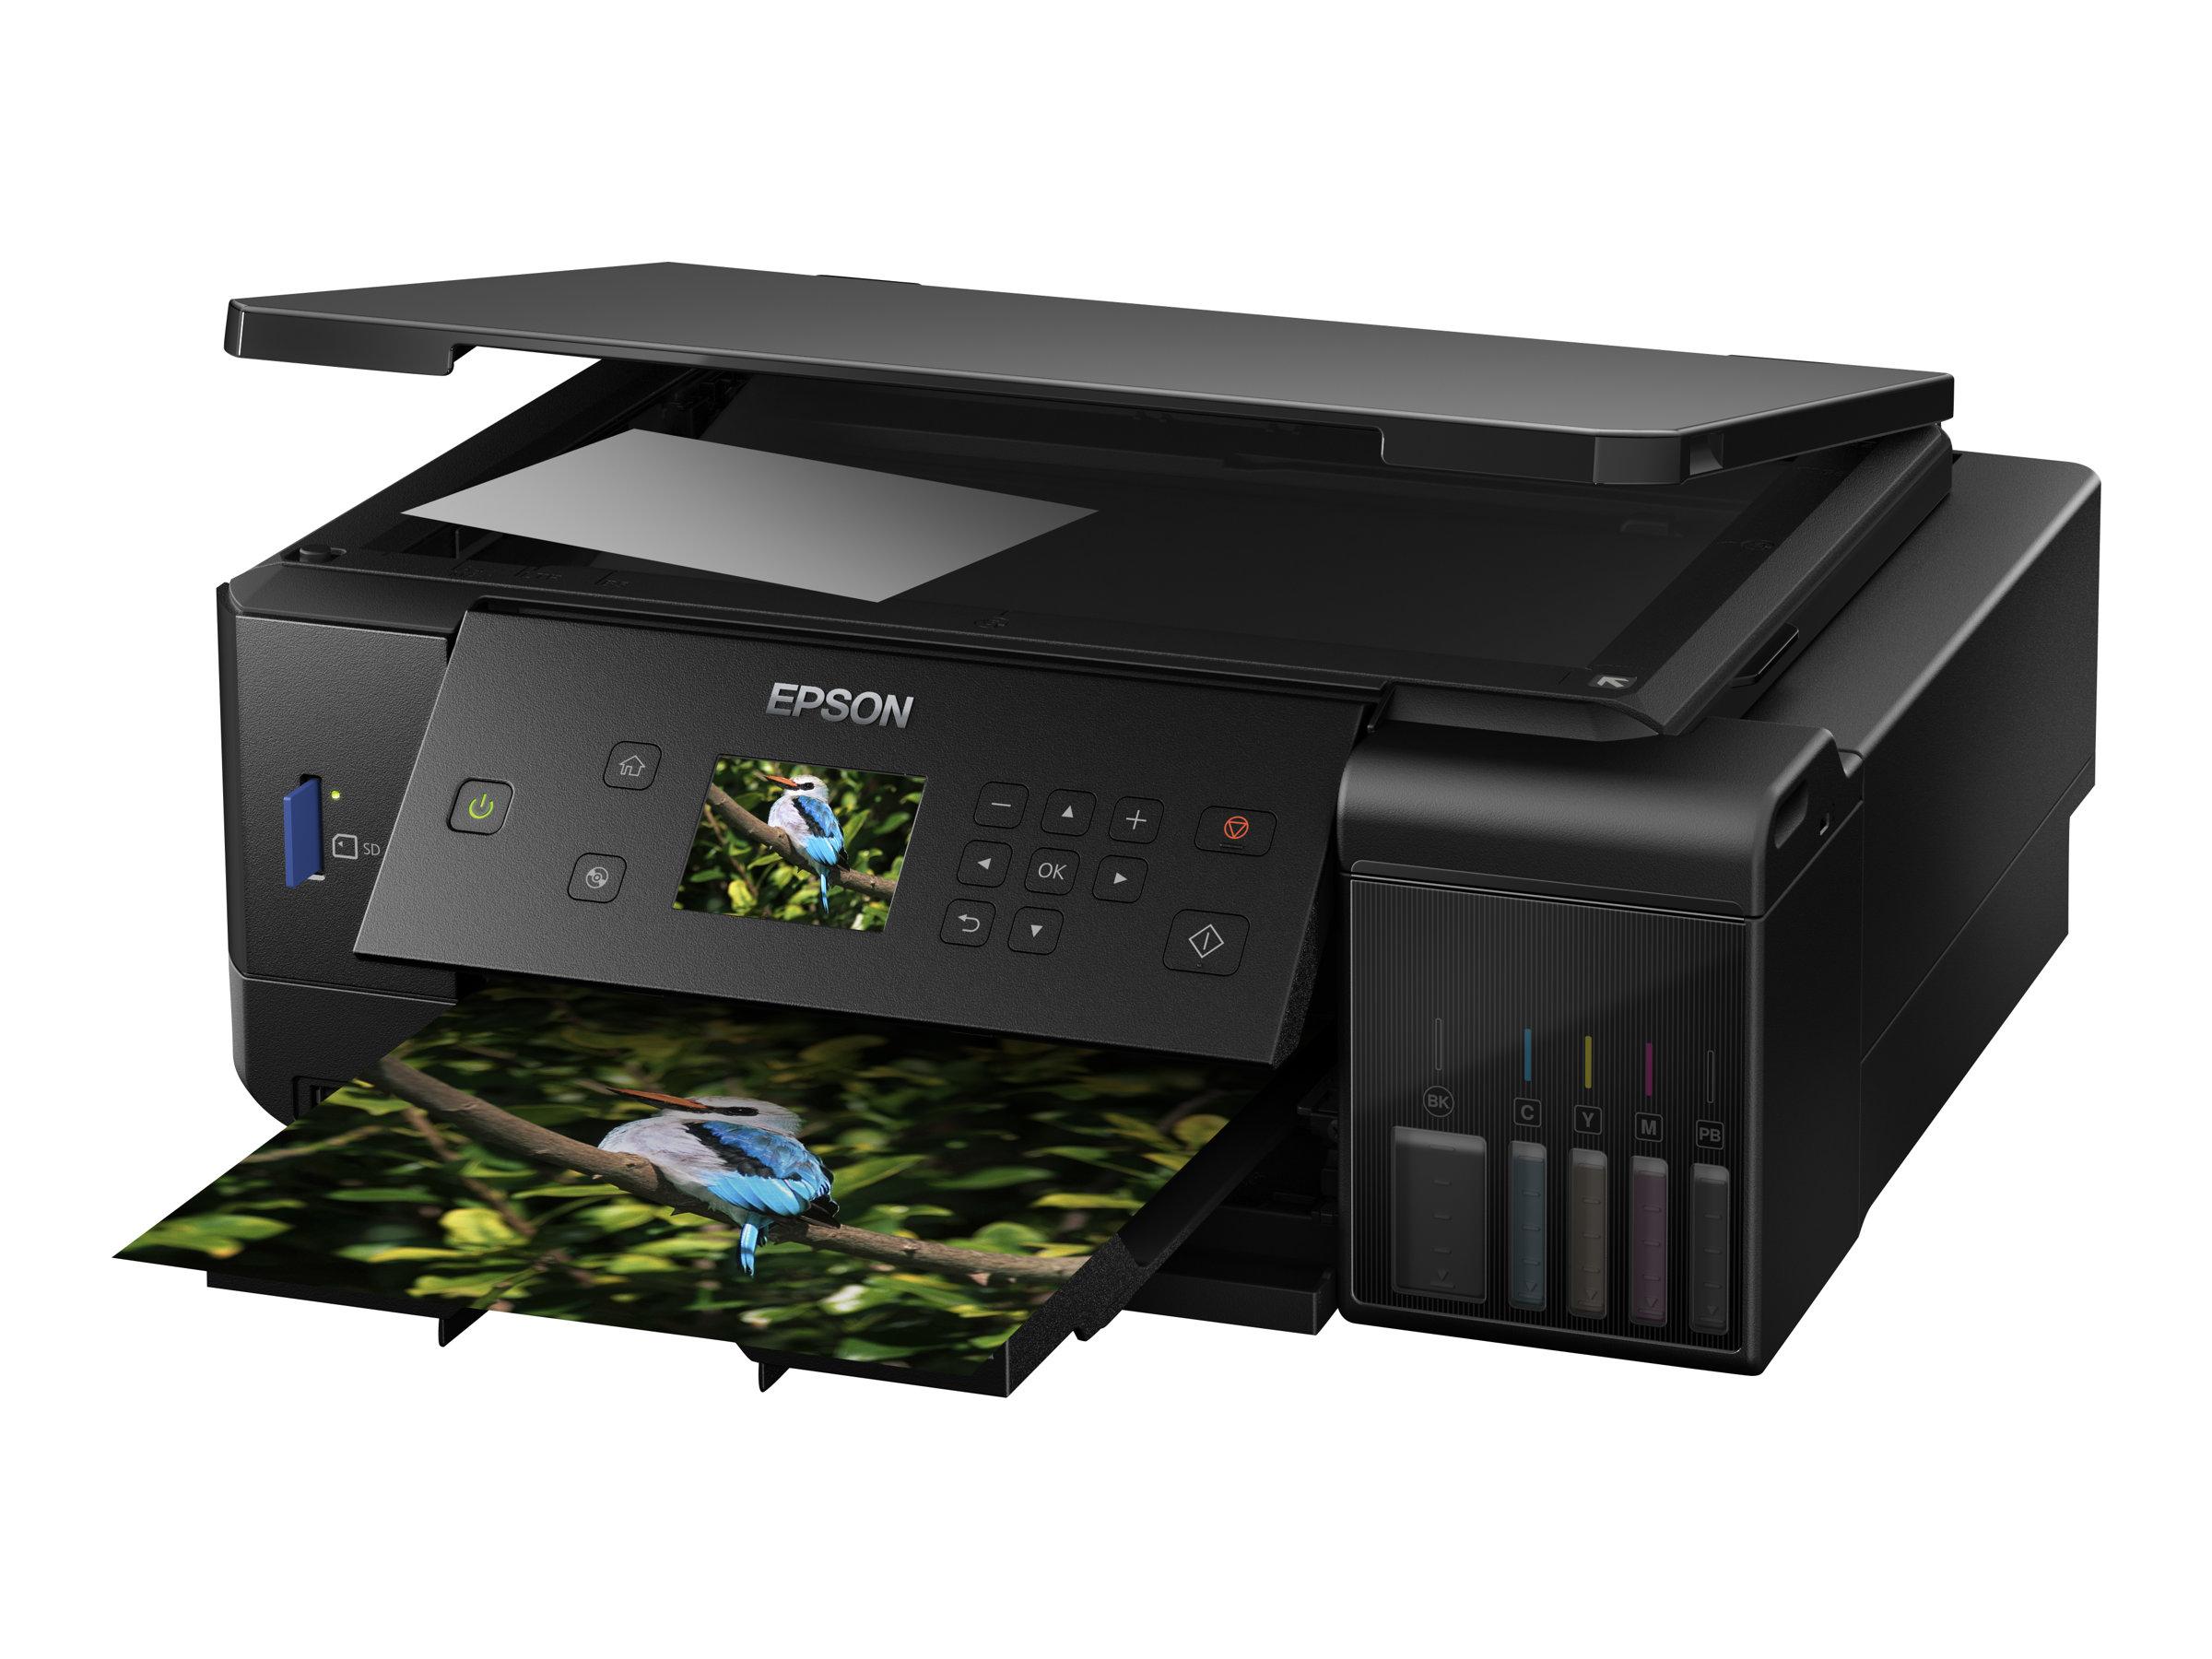 Epson EcoTank ET-7700 - Multifunktionsdrucker - Farbe - Tintenstrahl - A4 (210 x 297 mm) (Original) - A4/Legal (Medien)